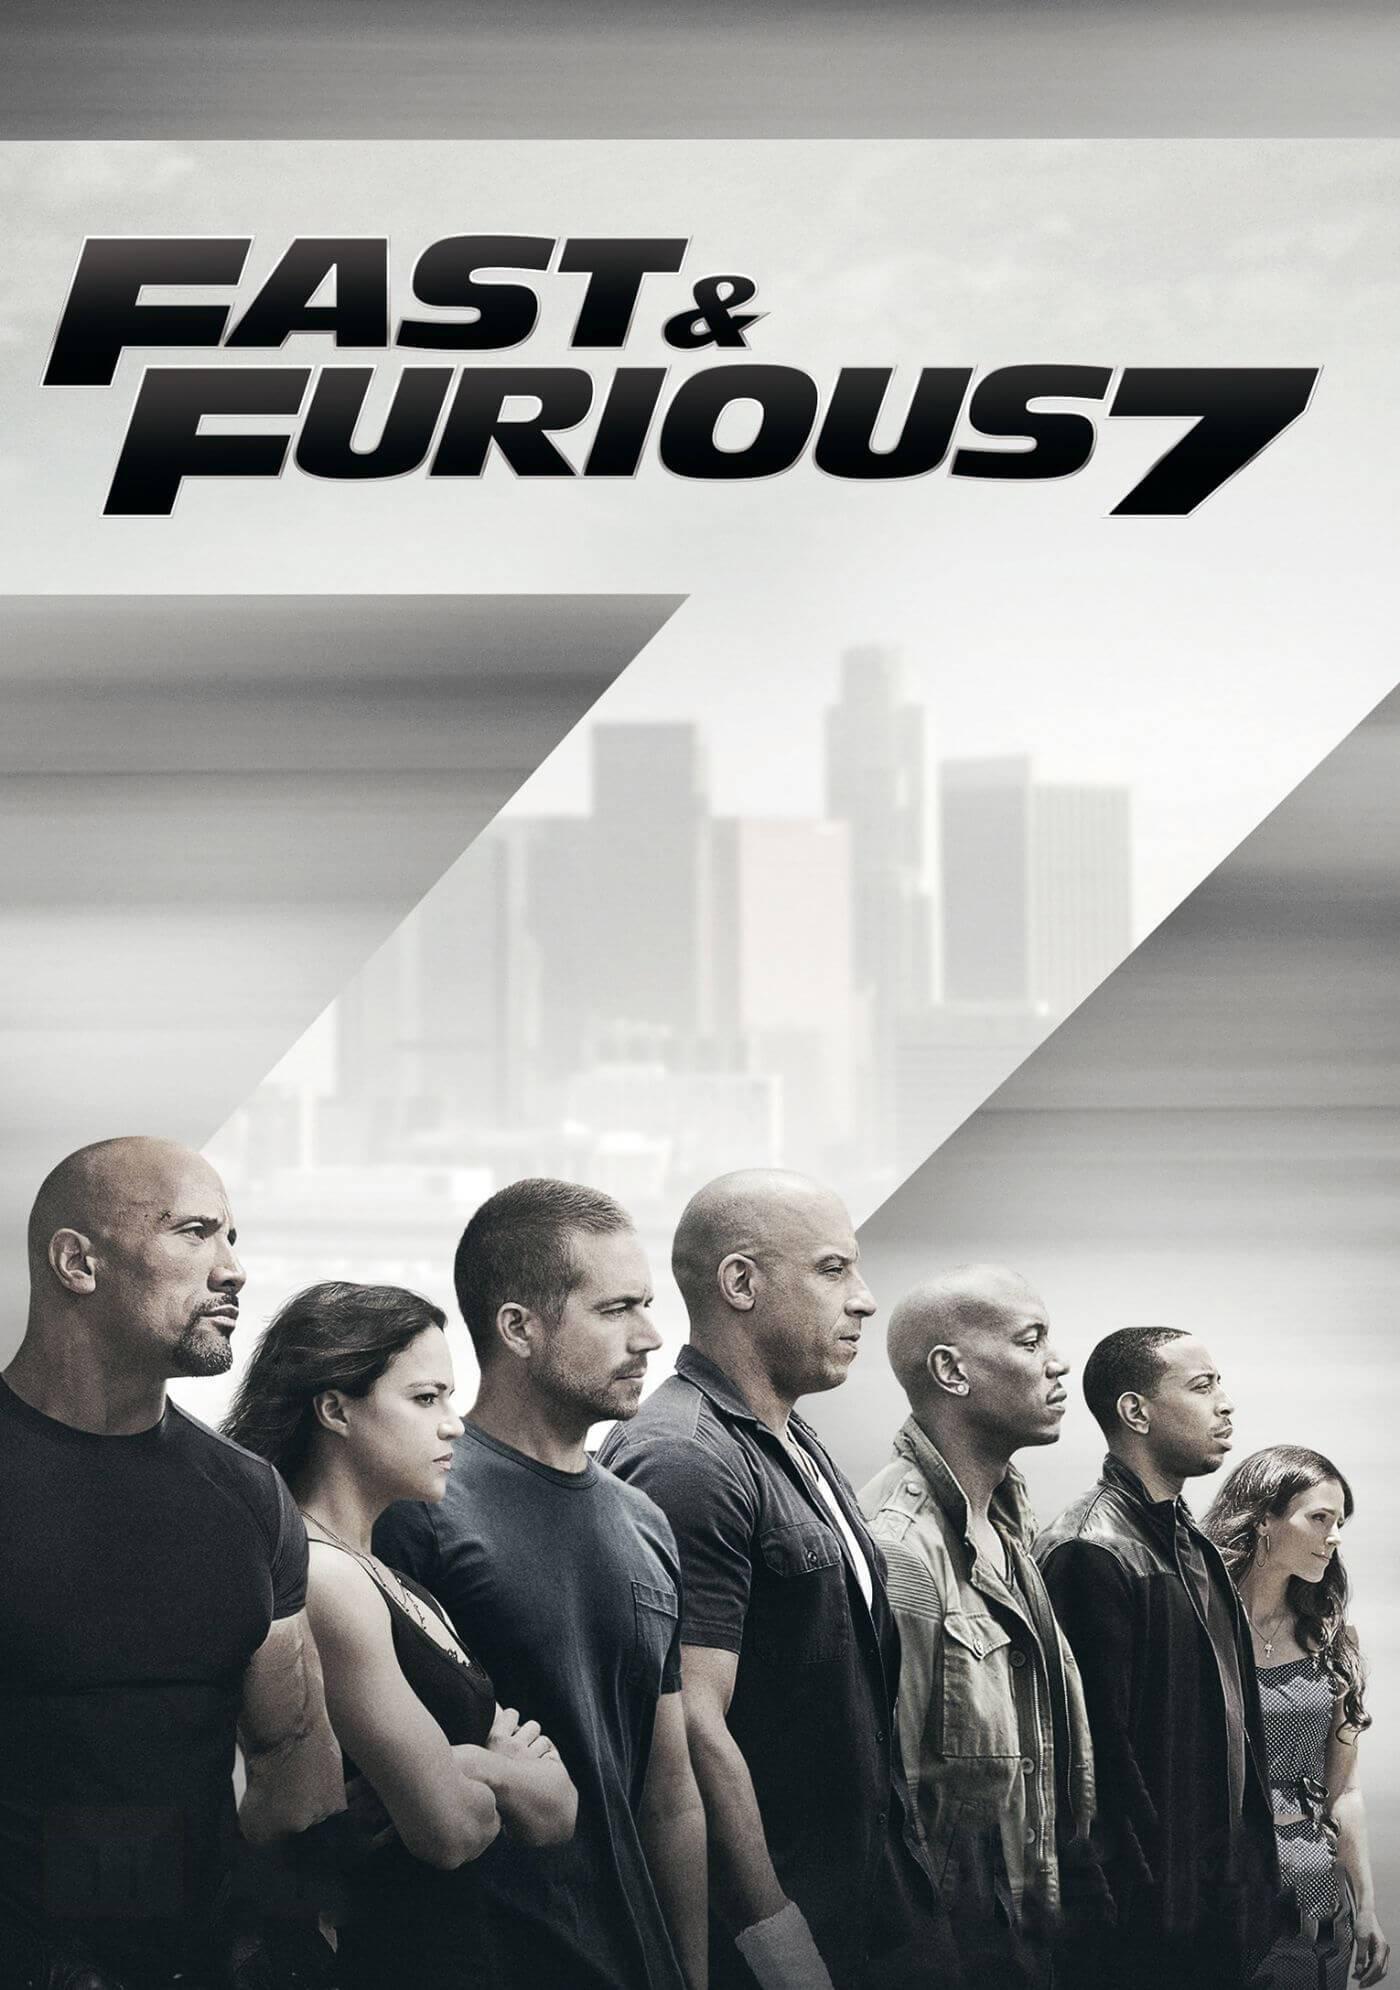 fast furious 7 paul walker vin diesel dwayne johnson hollywood action movie poster posters